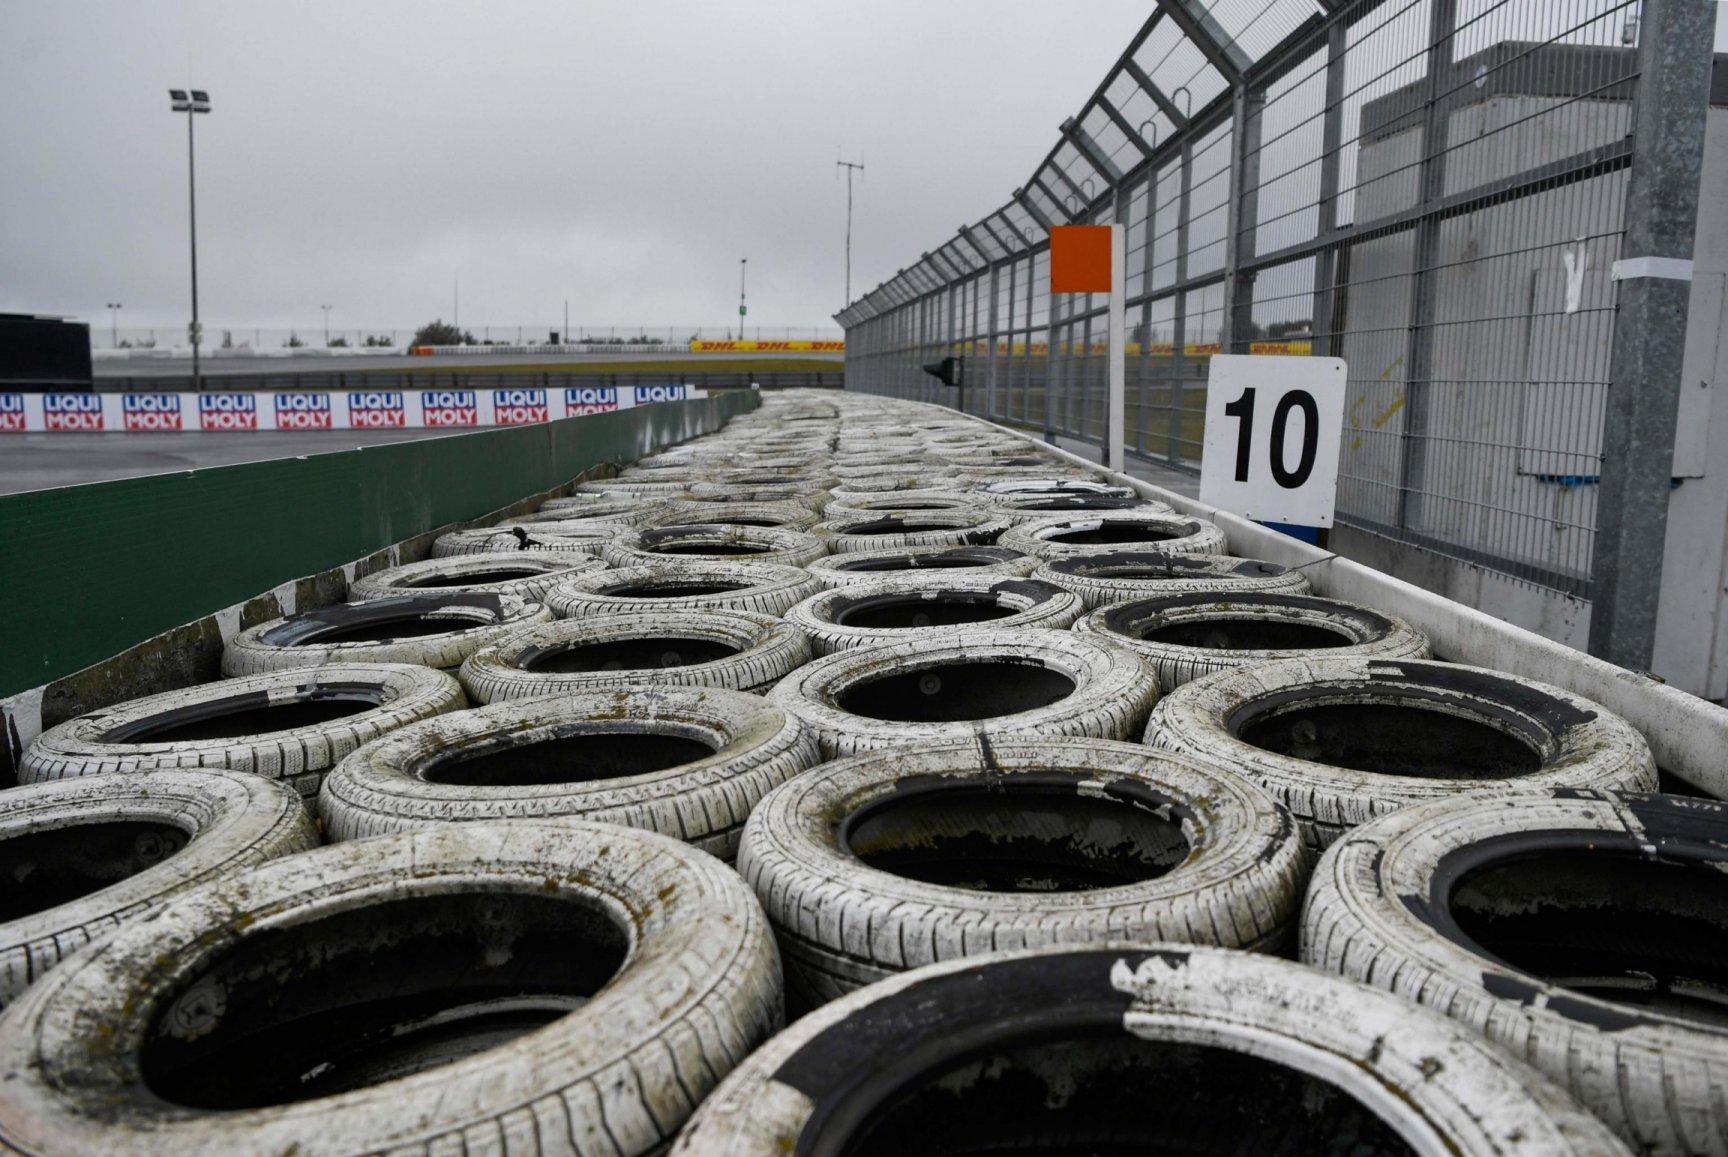 Sky Sport F1, Diretta Esclusiva Gp Eifel 2020. In chiaro differita TV8